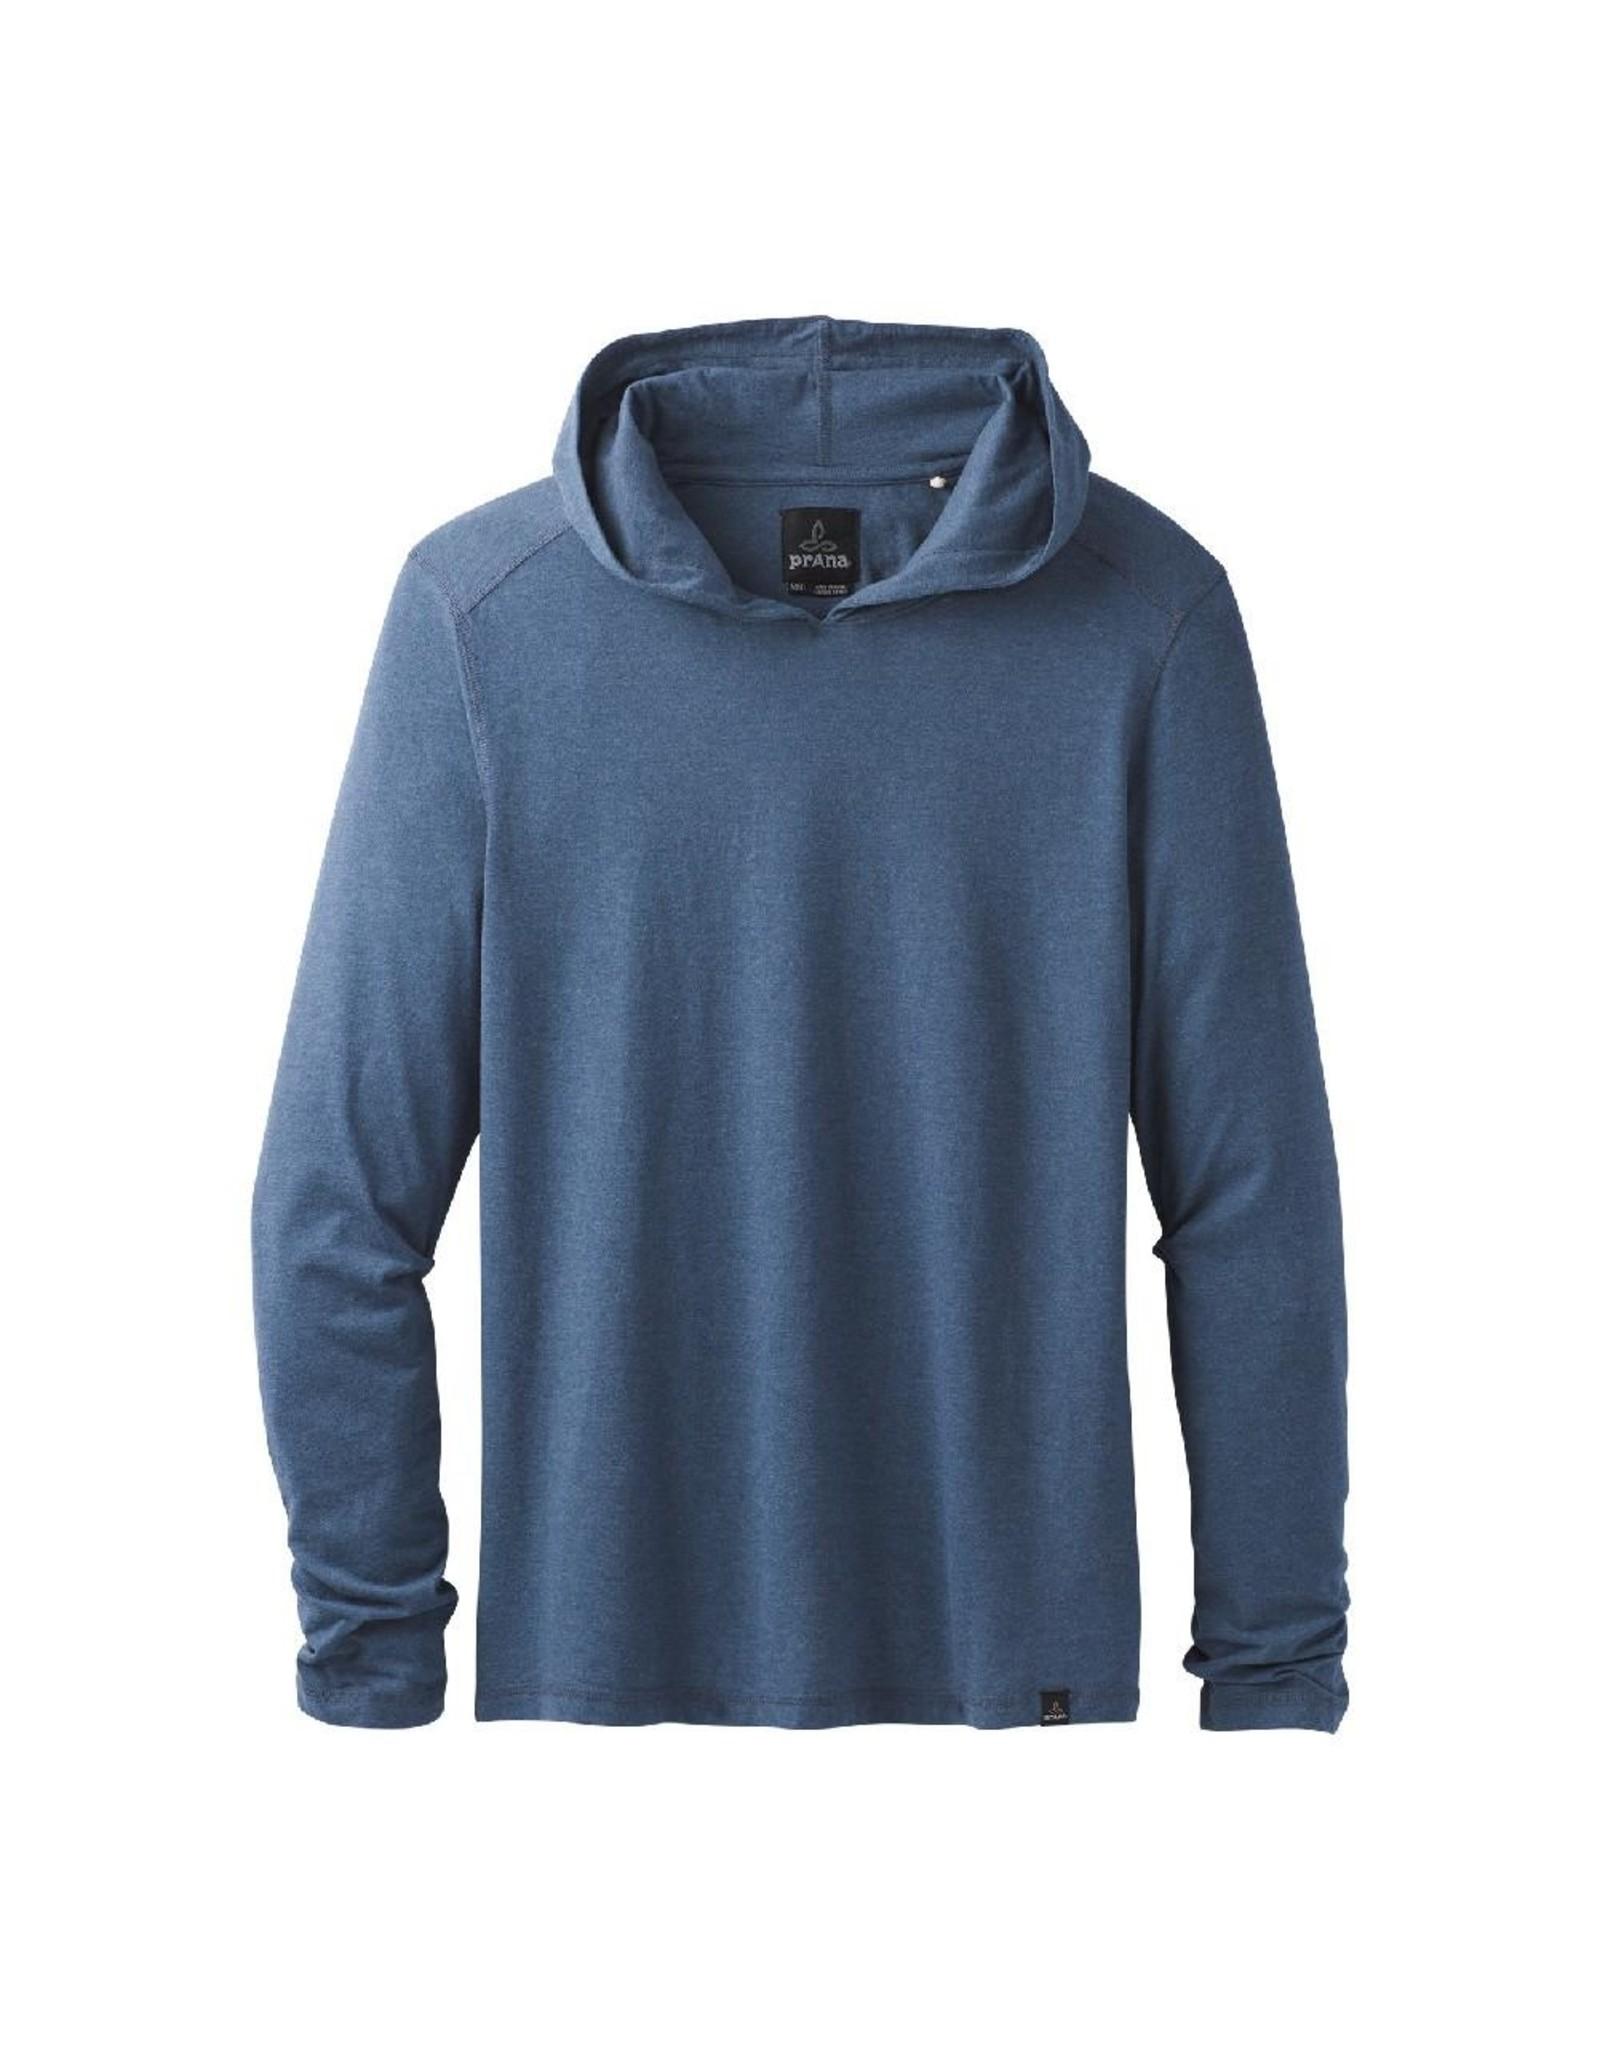 M Prana Hooded T-Shirt